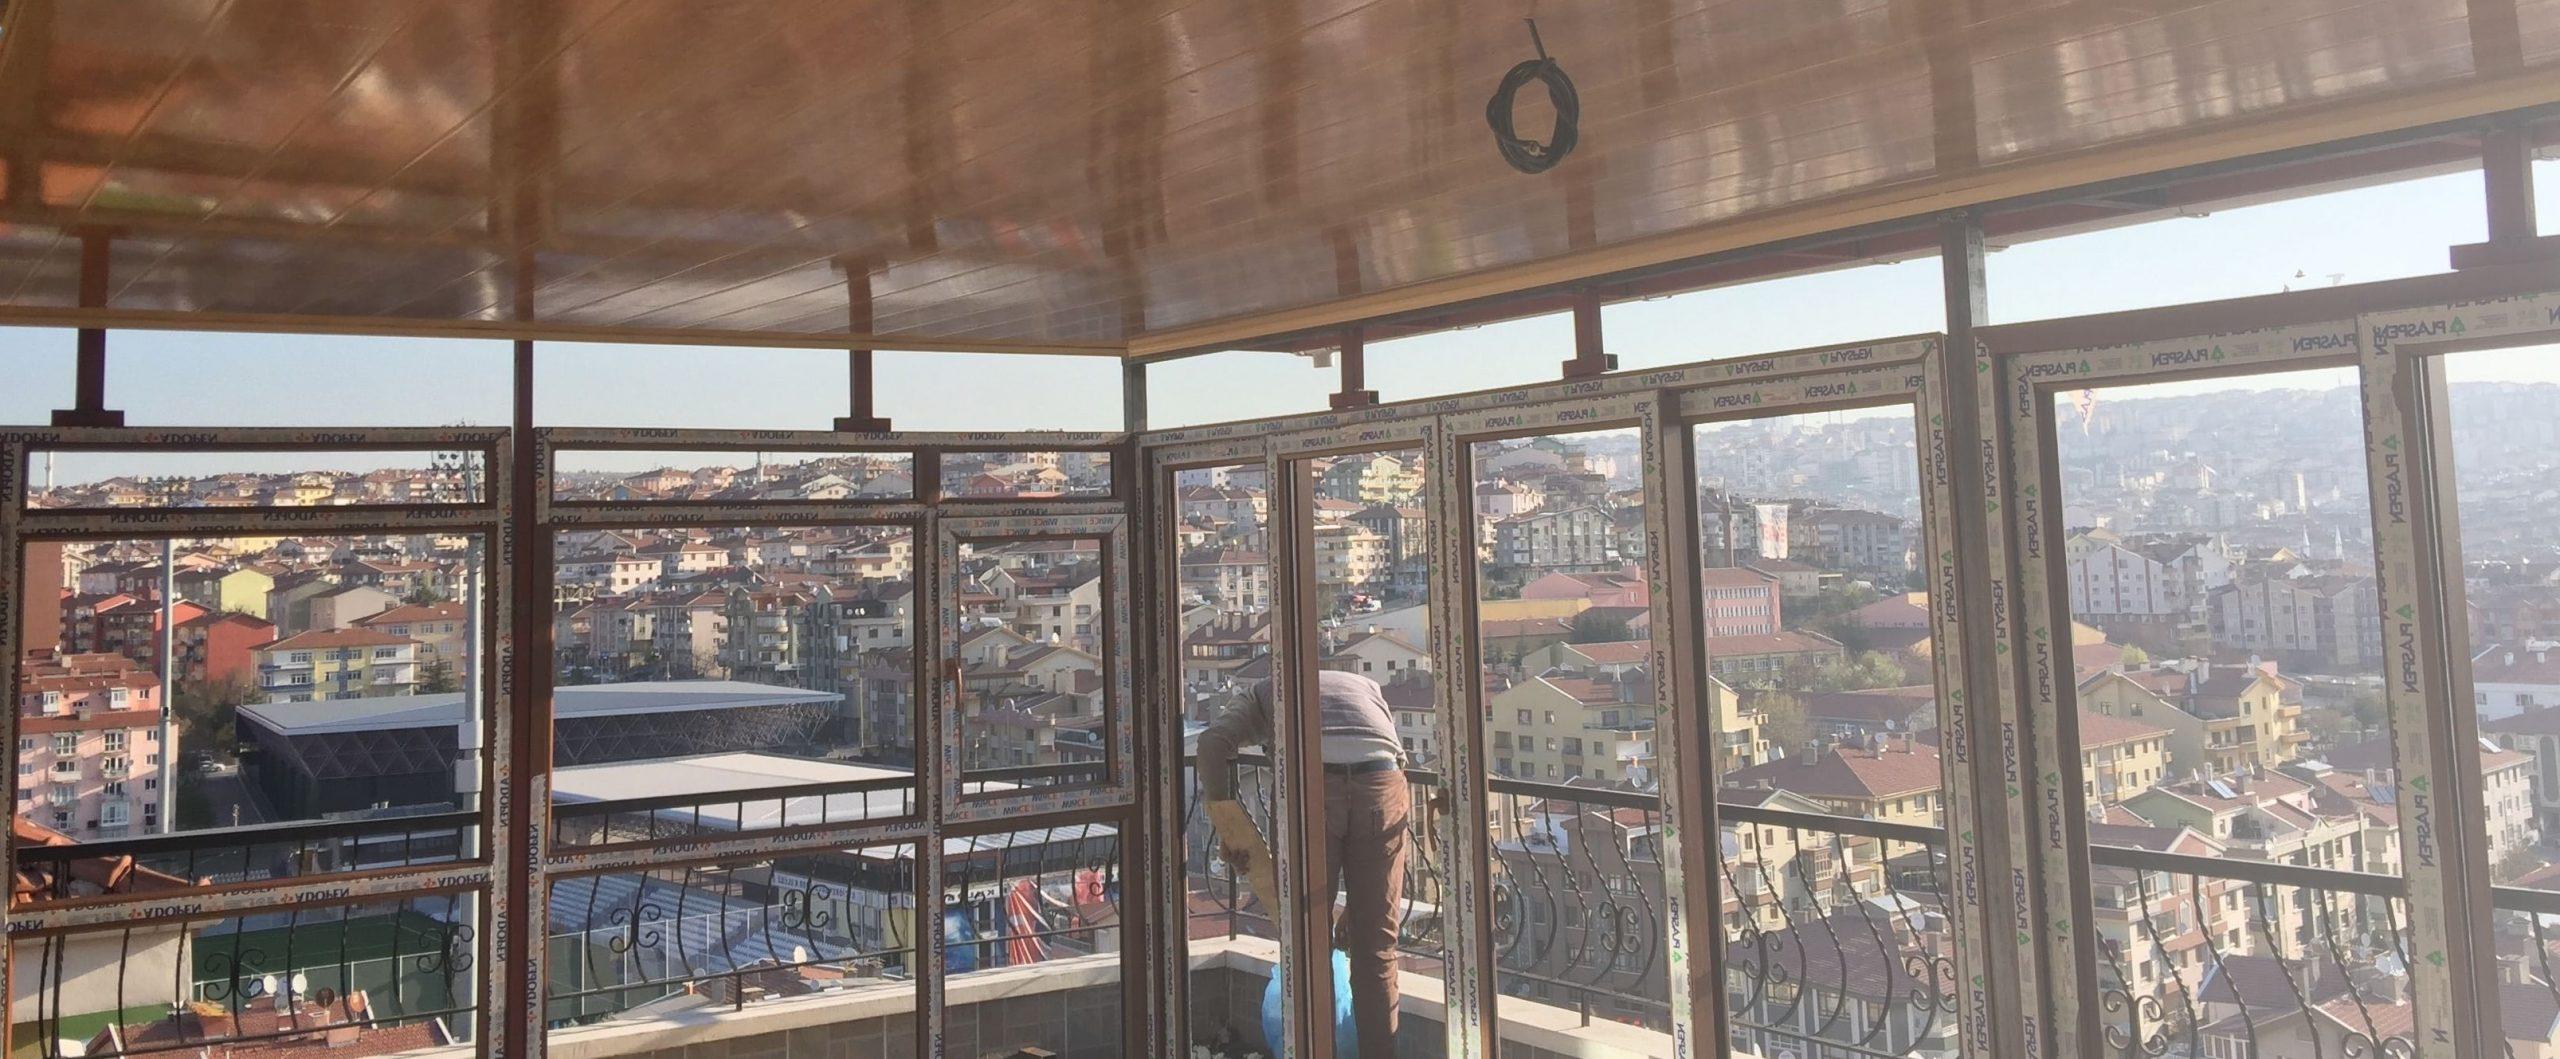 İzmir teras kapatma görselleri